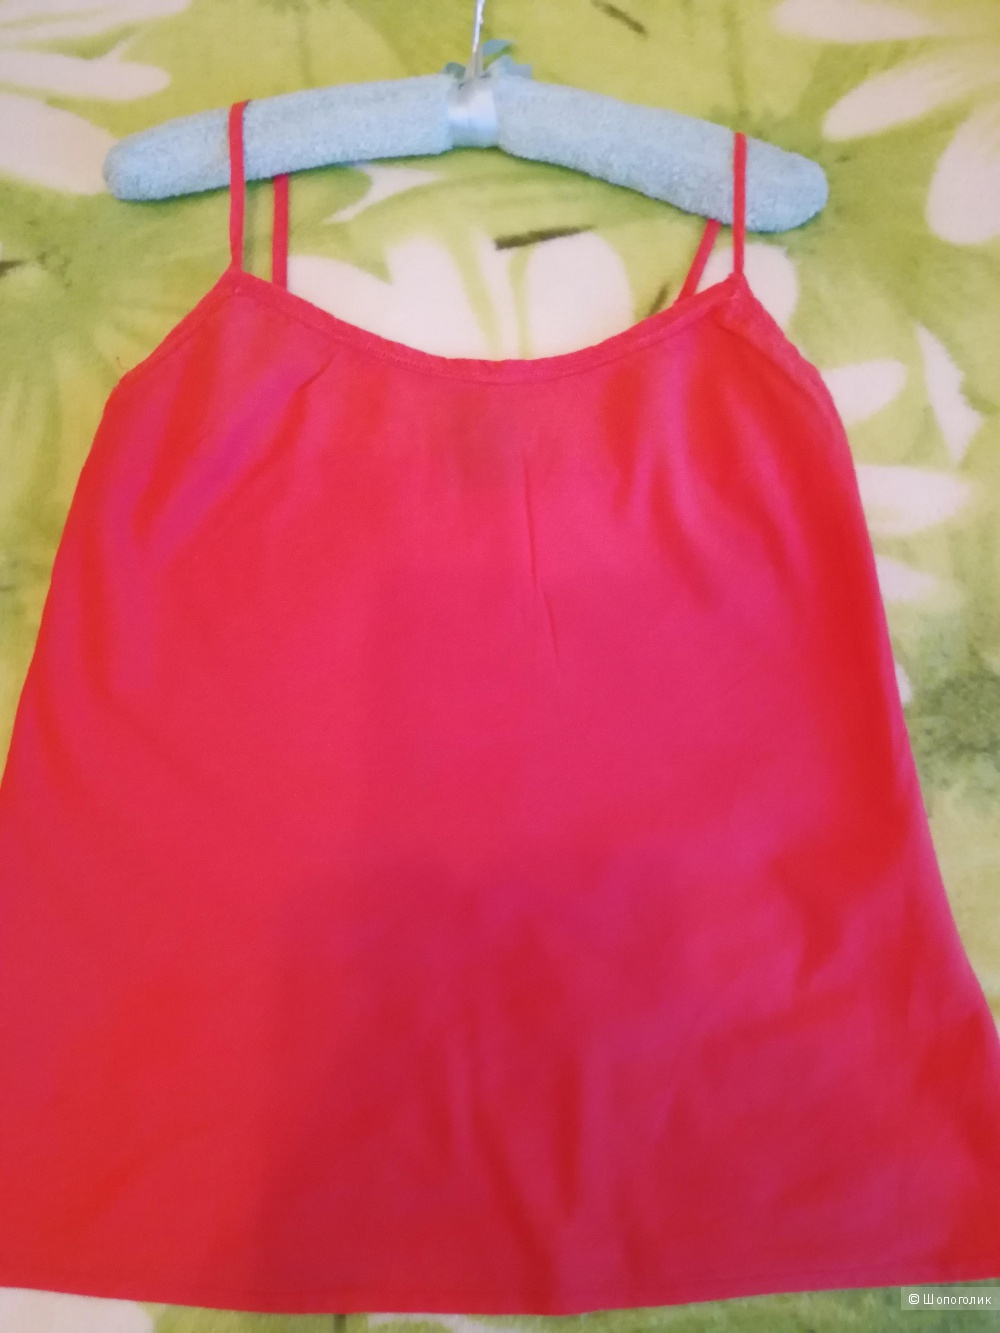 Топ Mango р.42 + шорты Verо Moda p.36